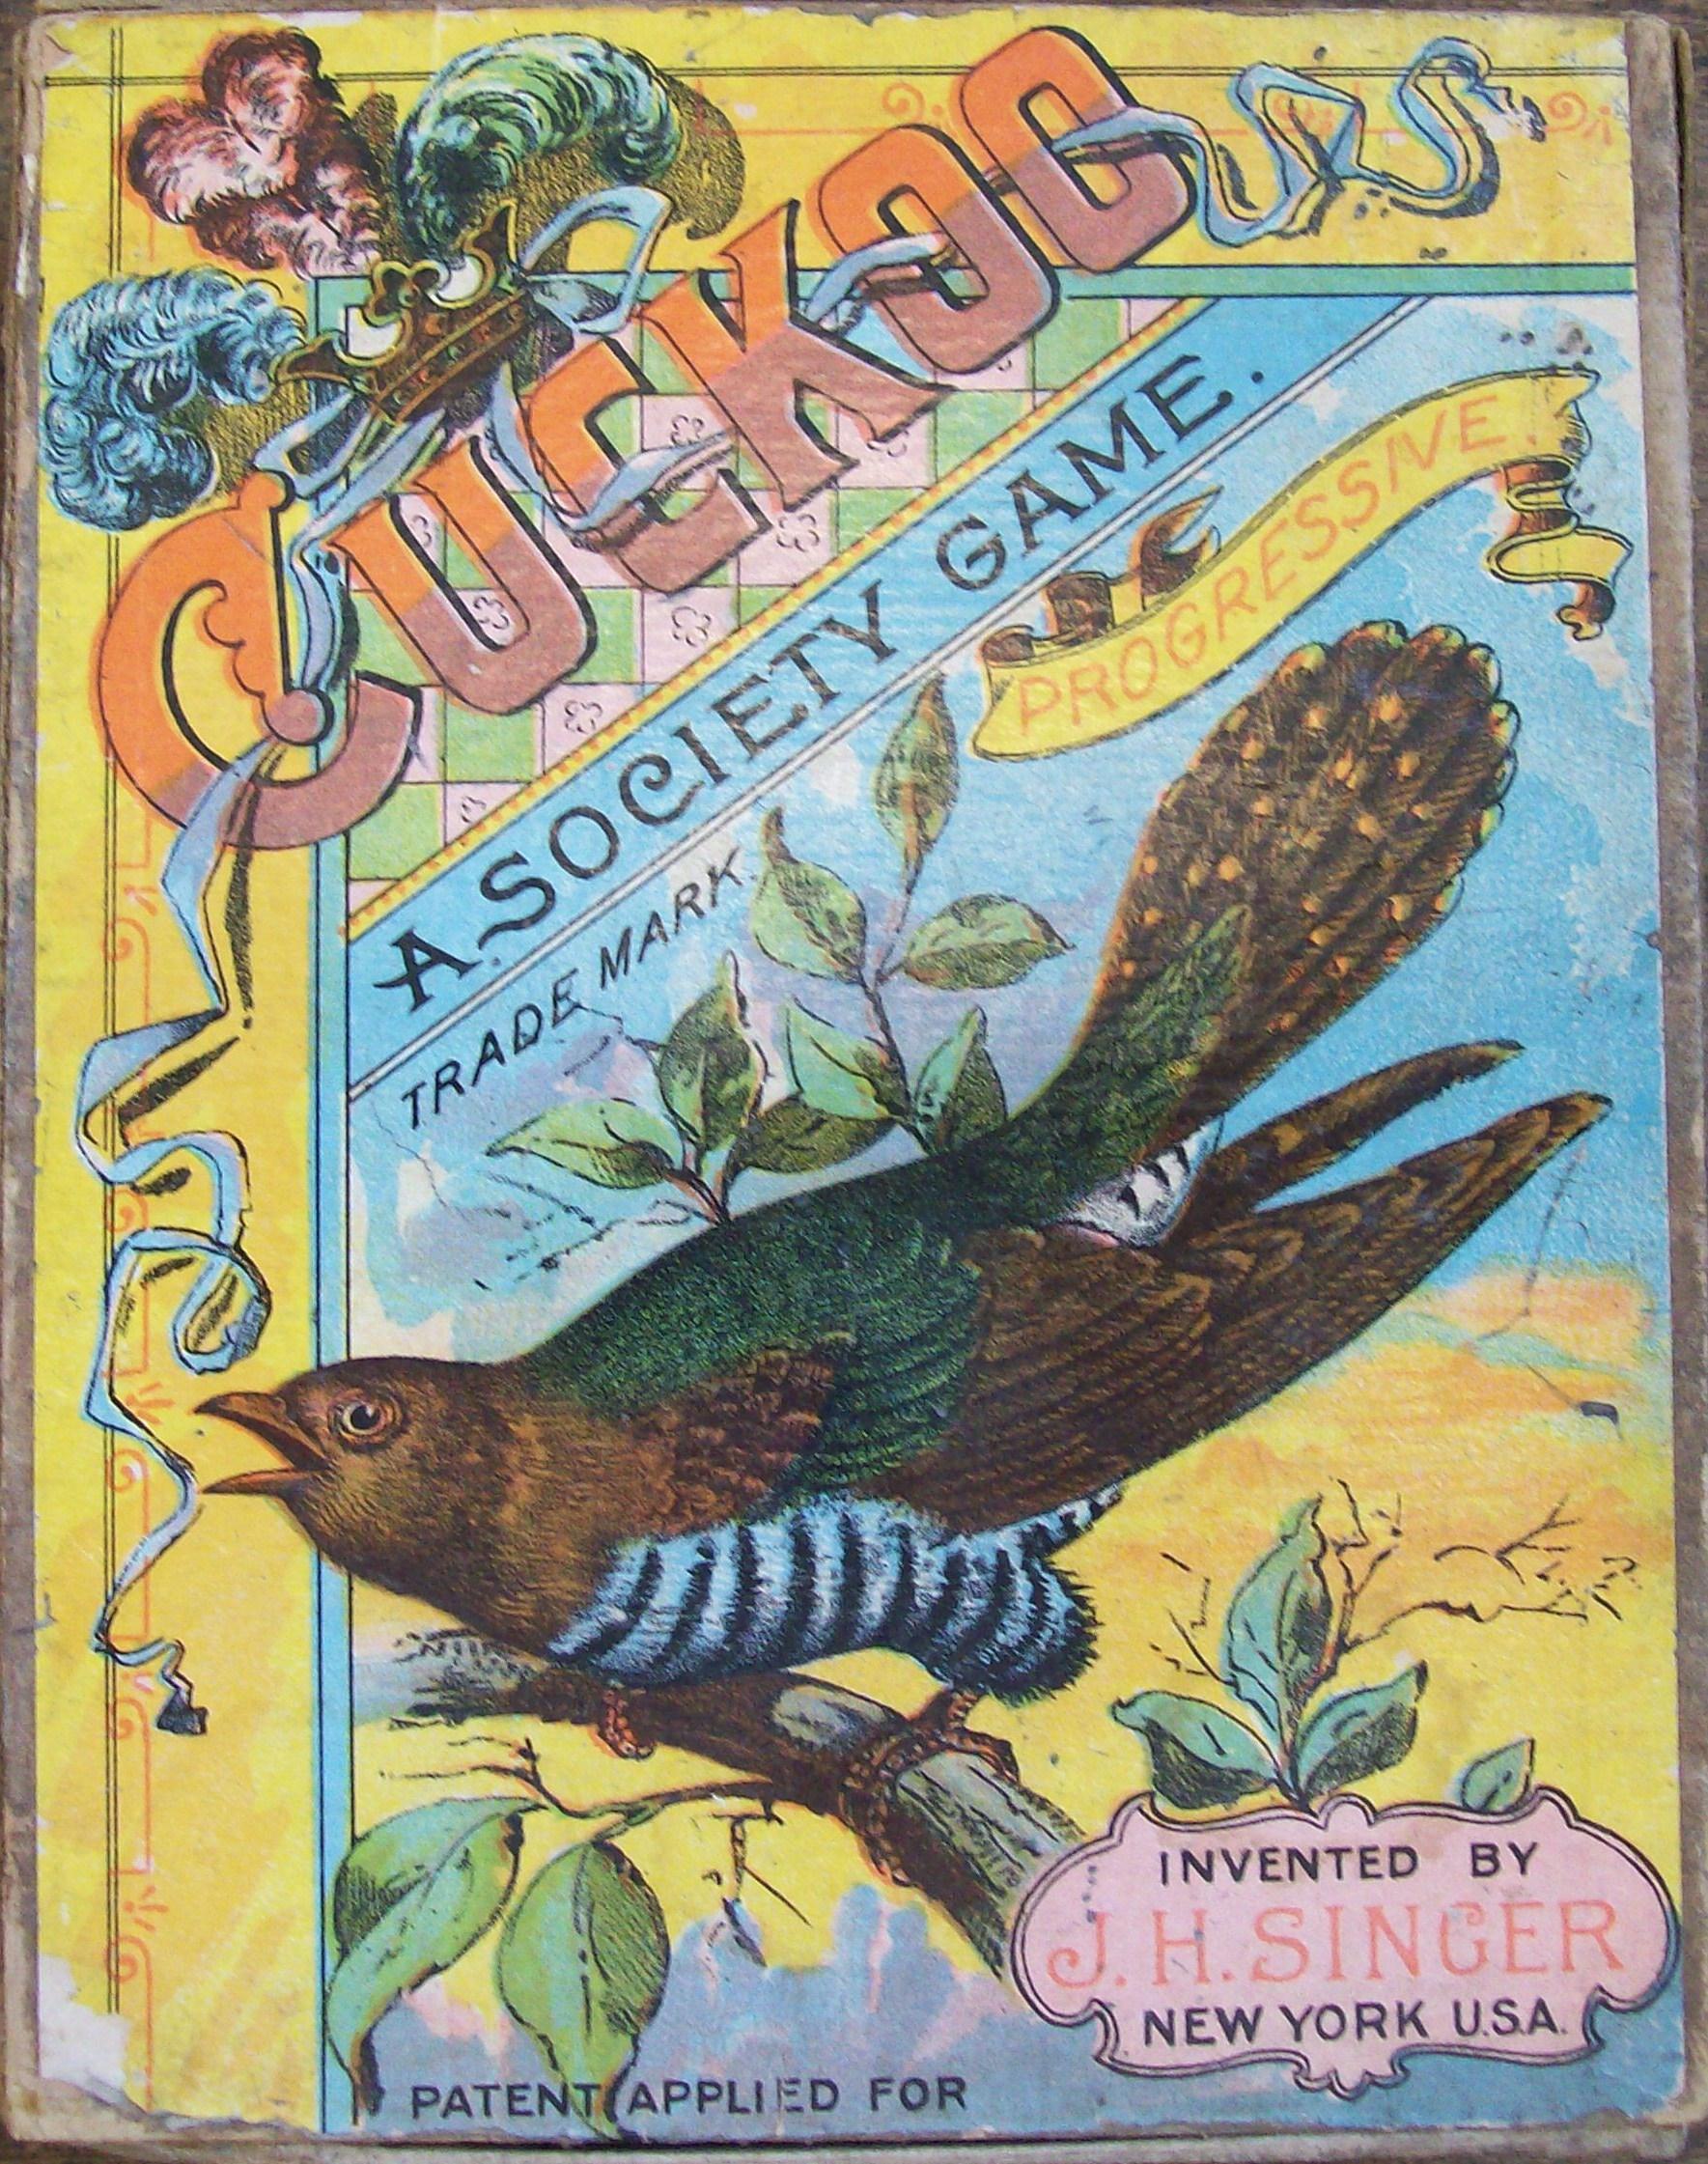 anitque game of J.H. Singer 1891 Cuckoo